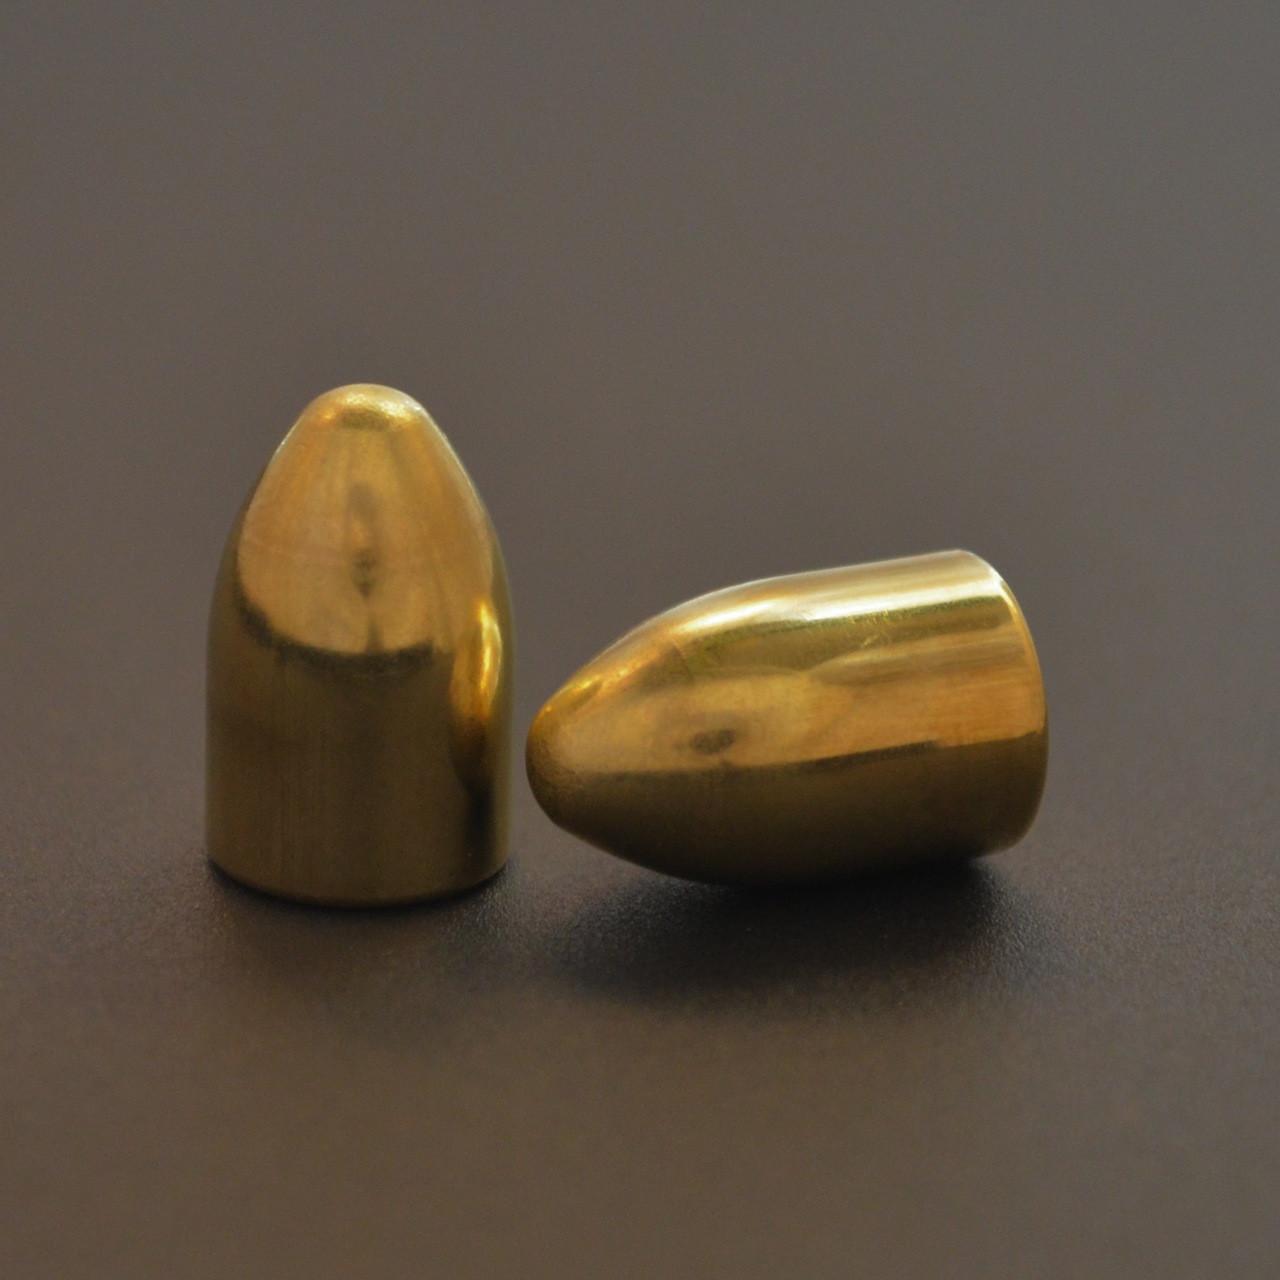 9mm/115gr CMJ - 500ct